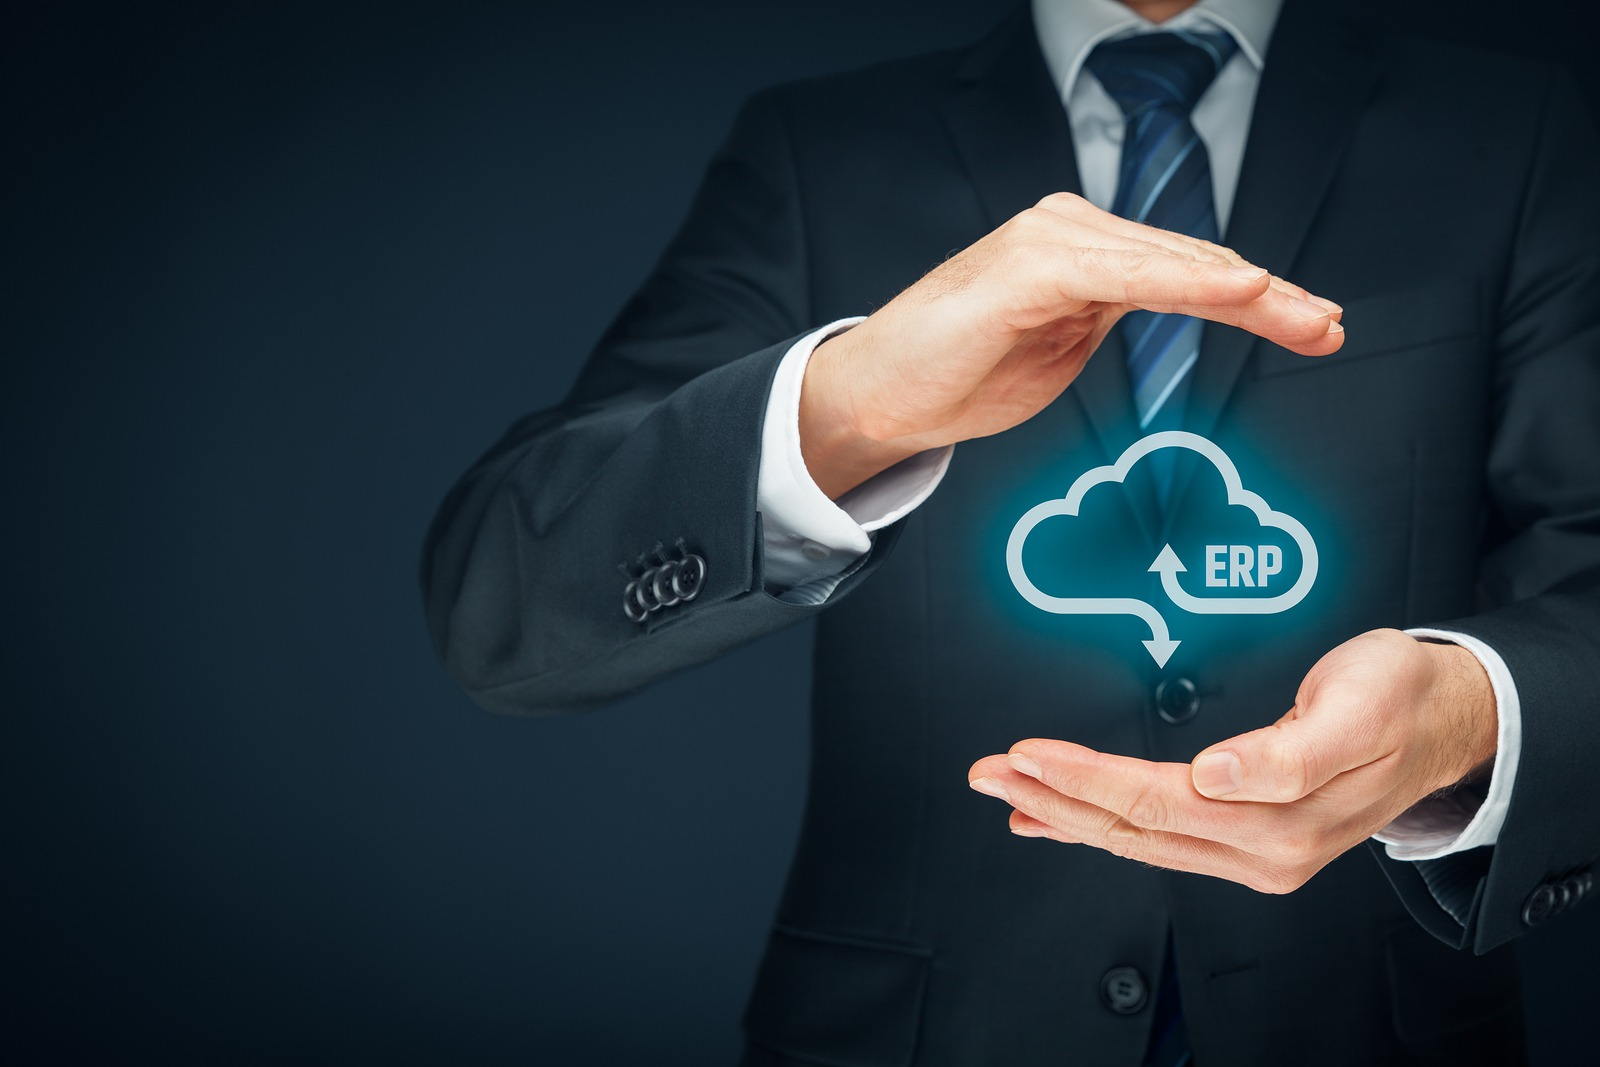 Cloud ERP illustration